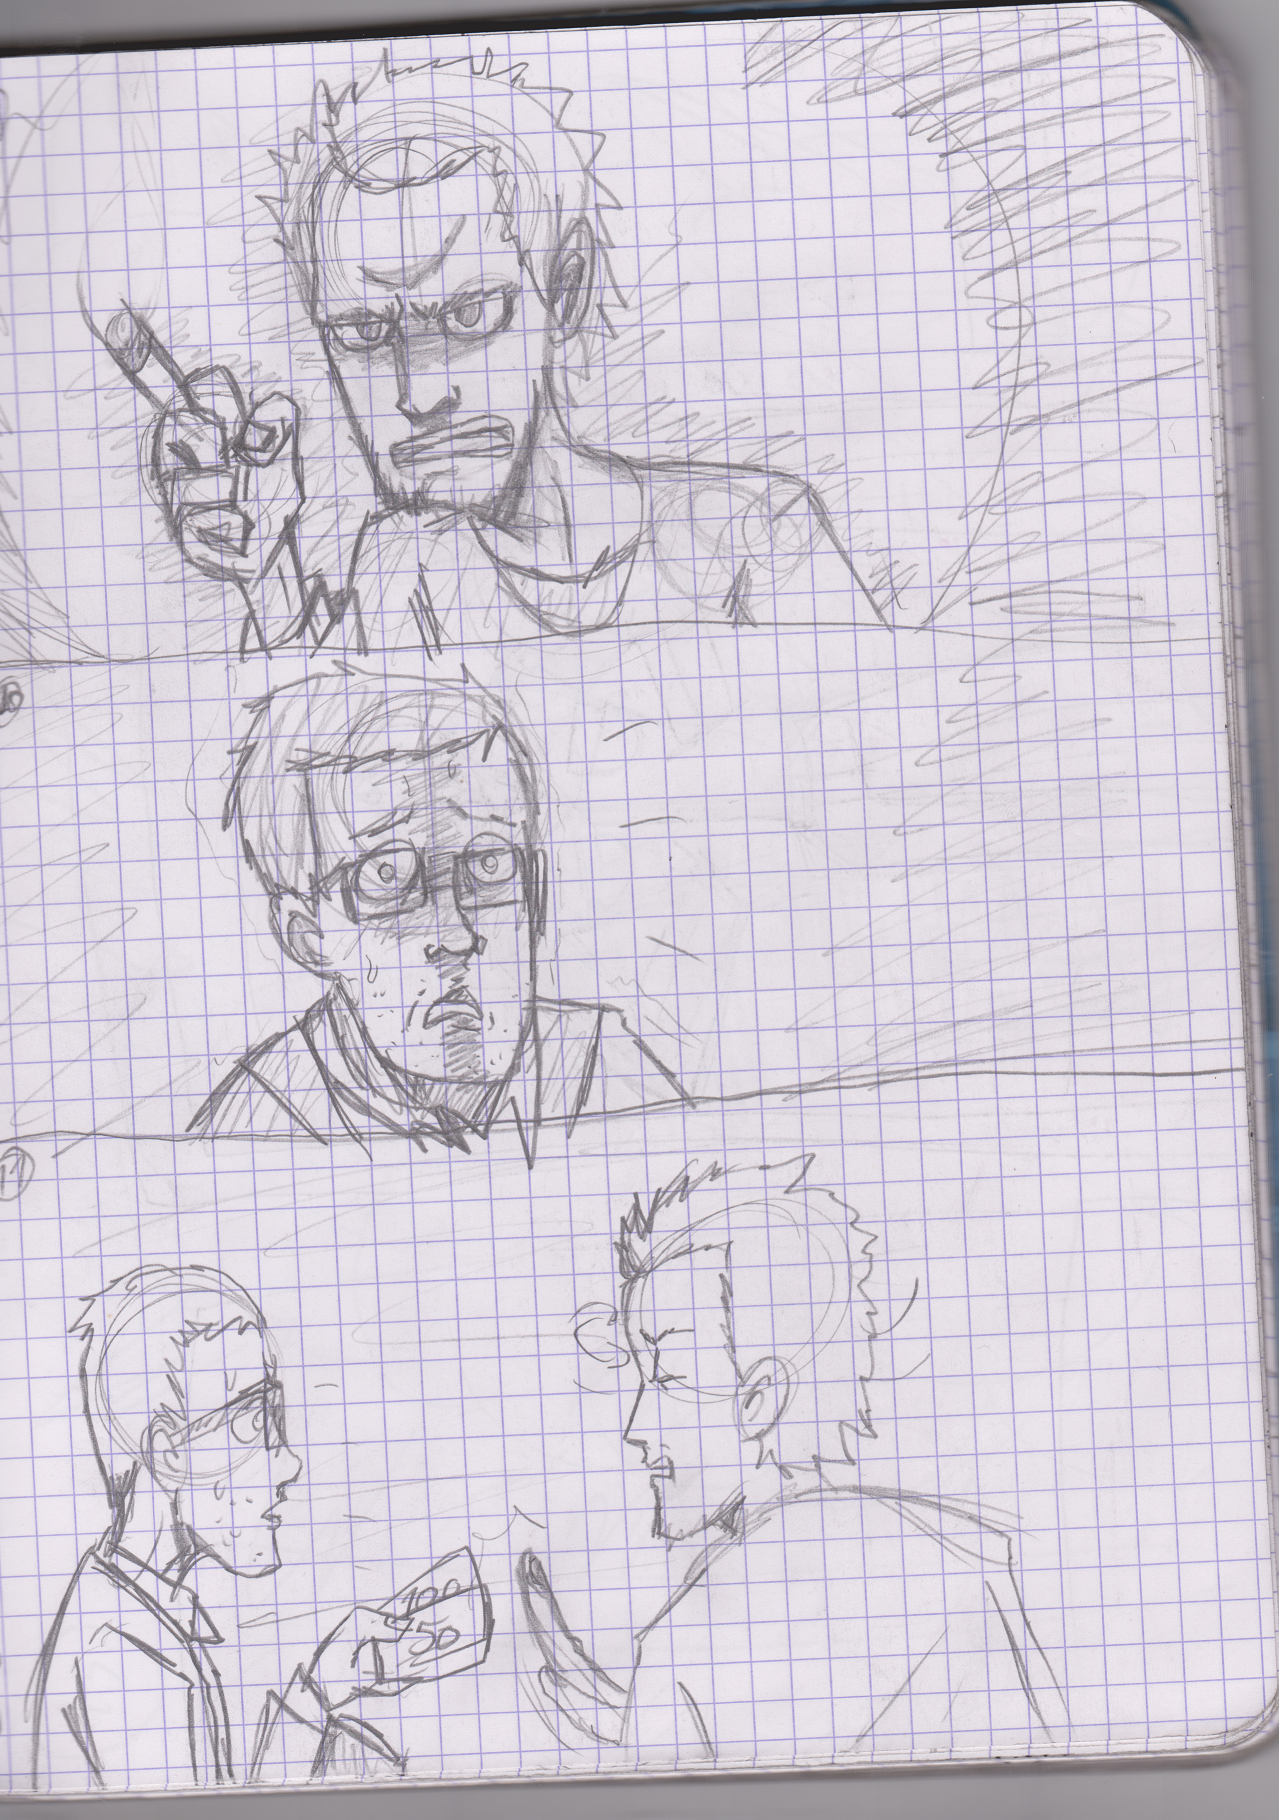 SH sketchbook page 53